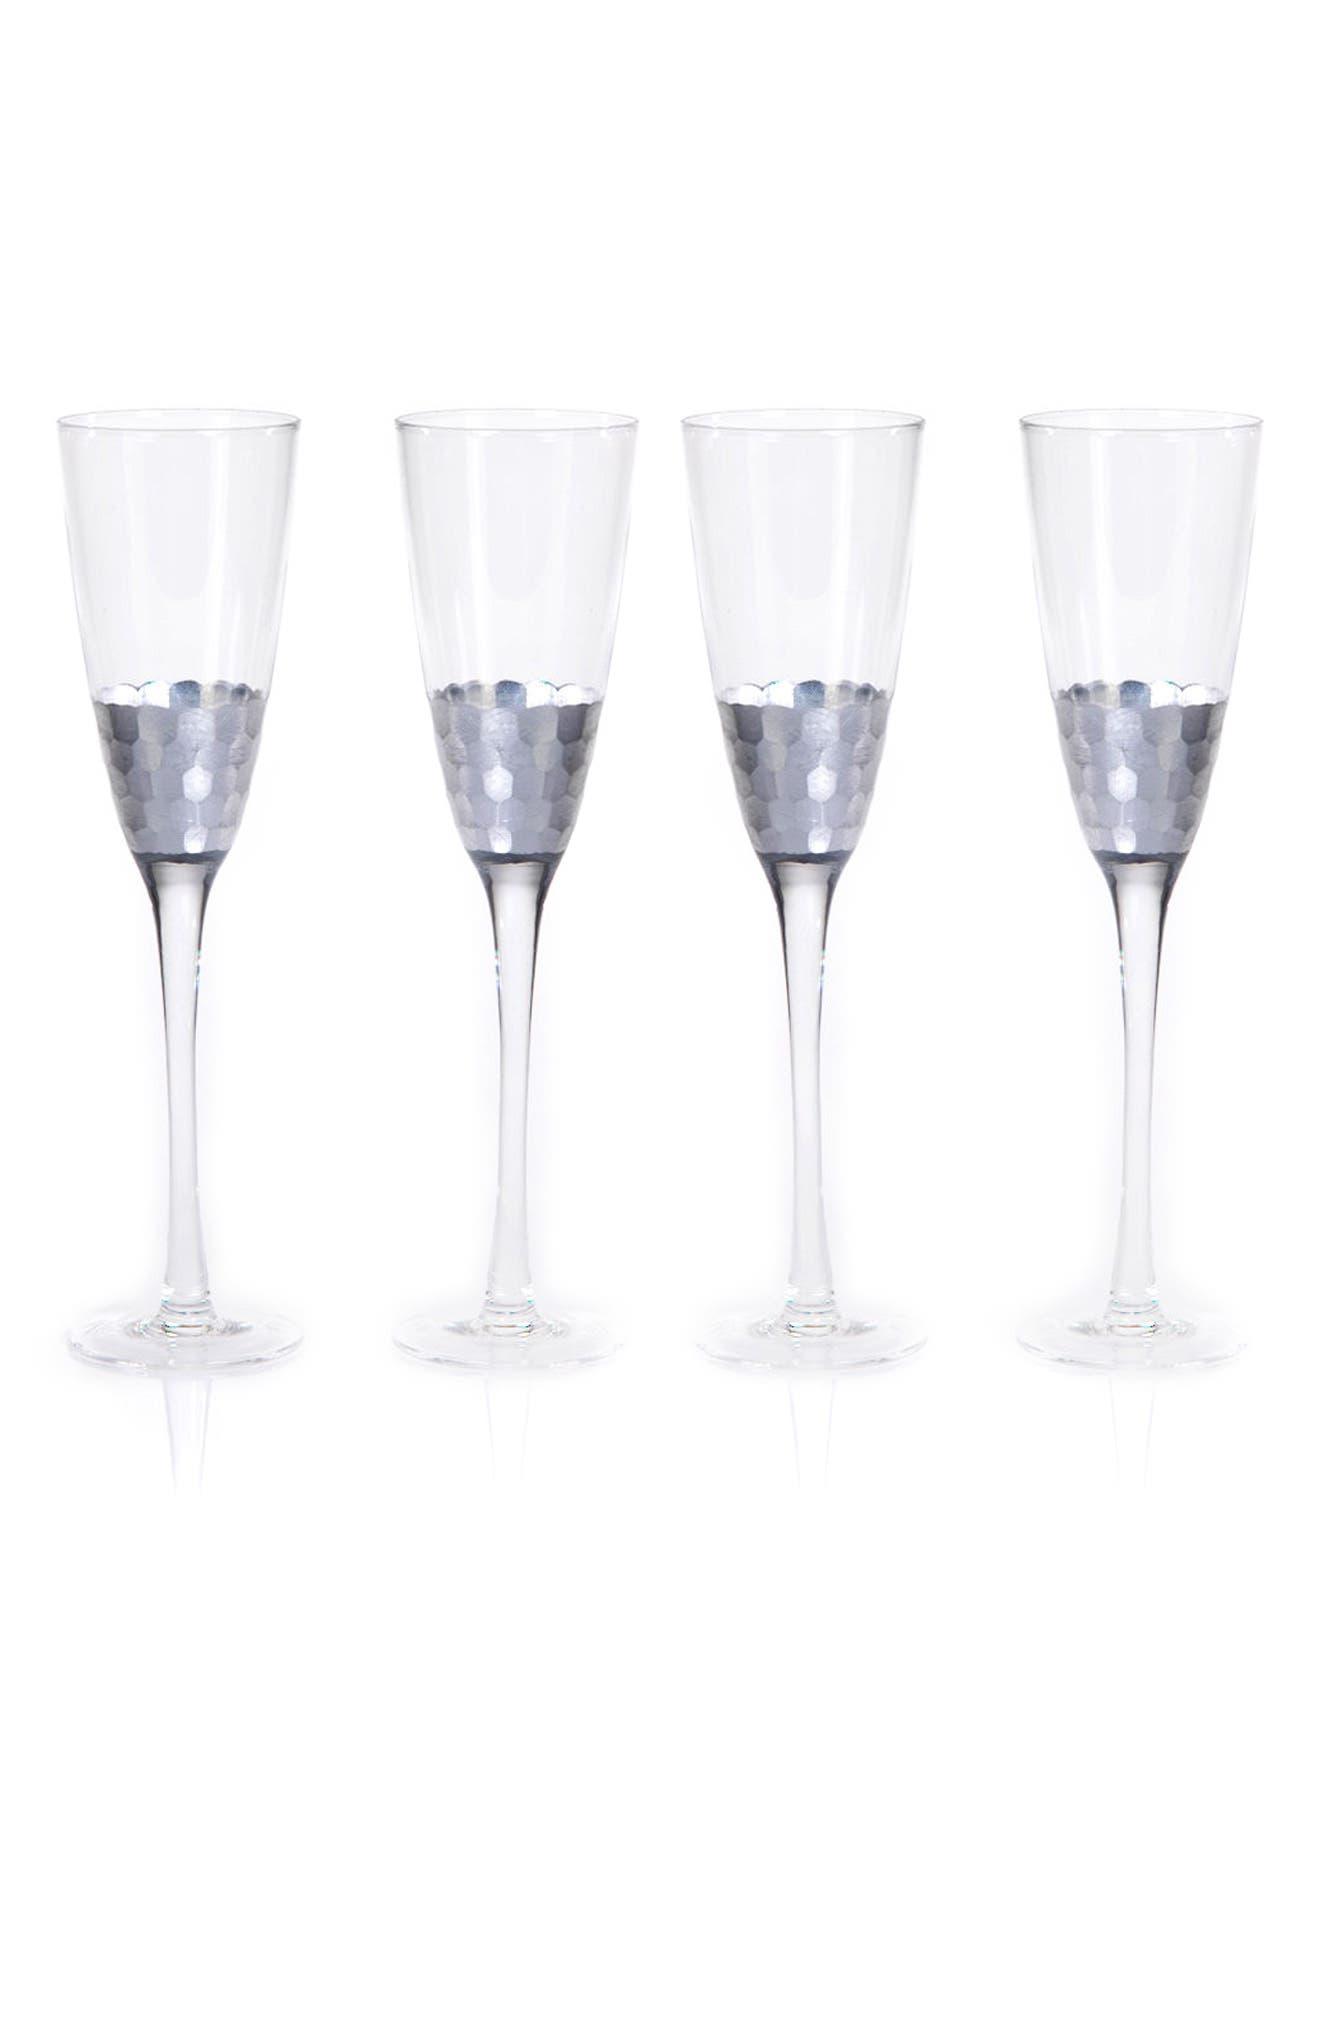 Main Image - Zodax Vitorrio Set of 4 Champagne Flutes